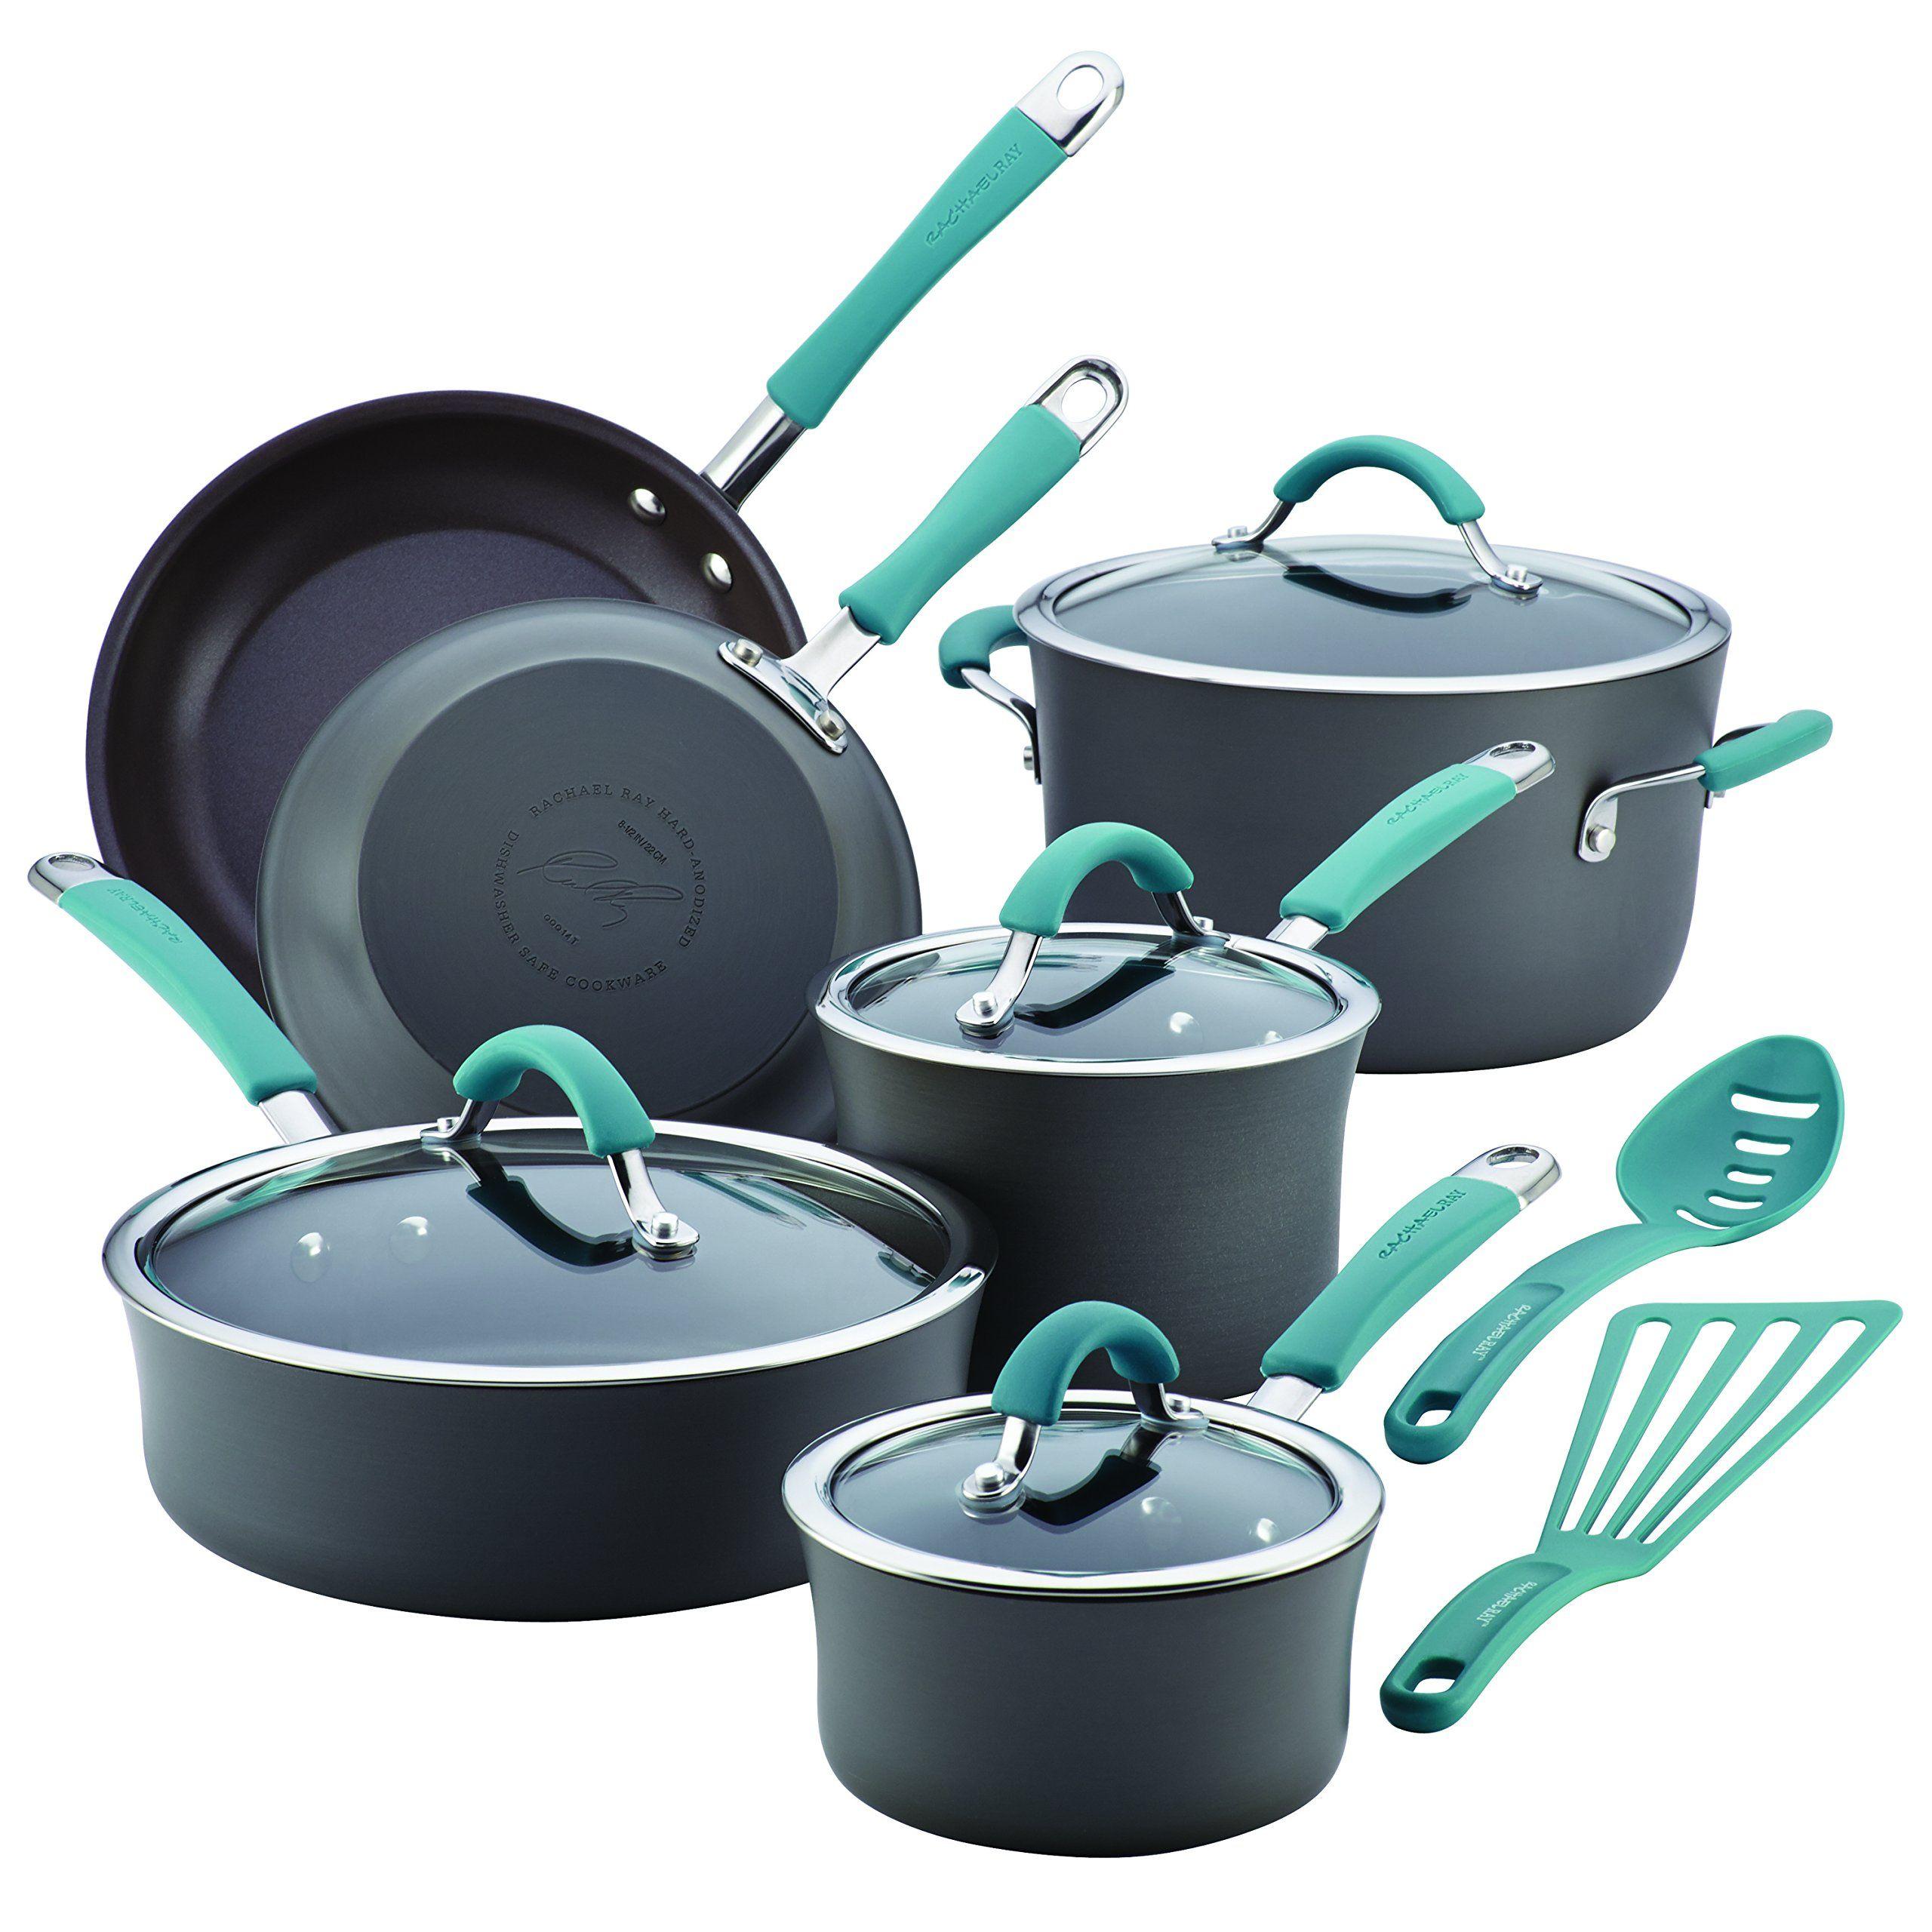 Rachael Ray Cucina 87641 12-Piece Cookware Set, Gray   Christmas ...